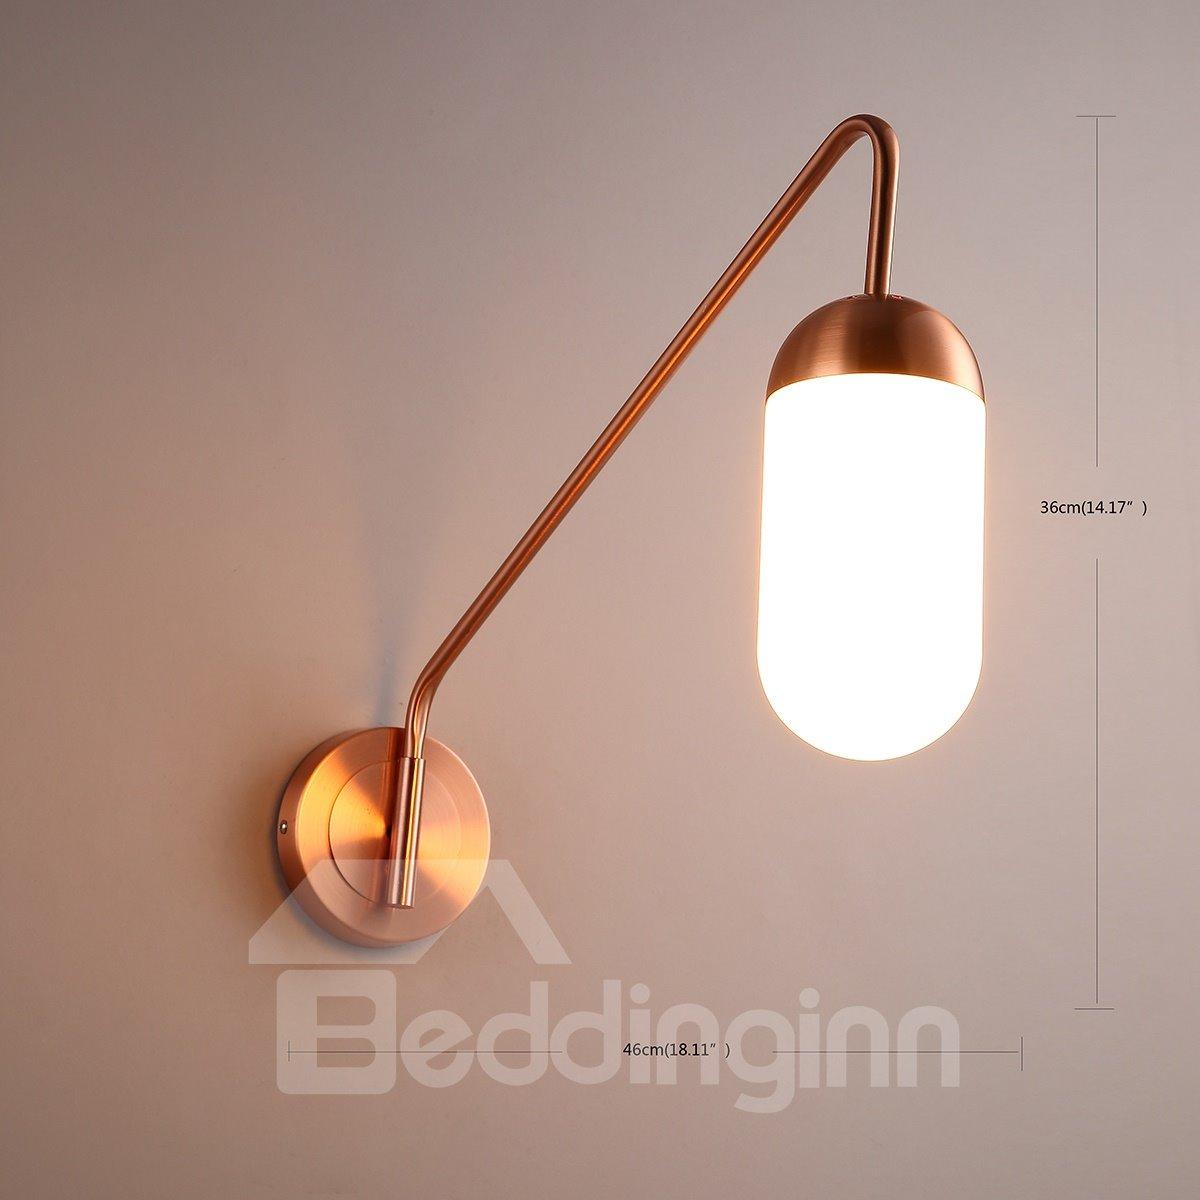 Golden Basis Hardware Modern Simple 1-Head Wall Light